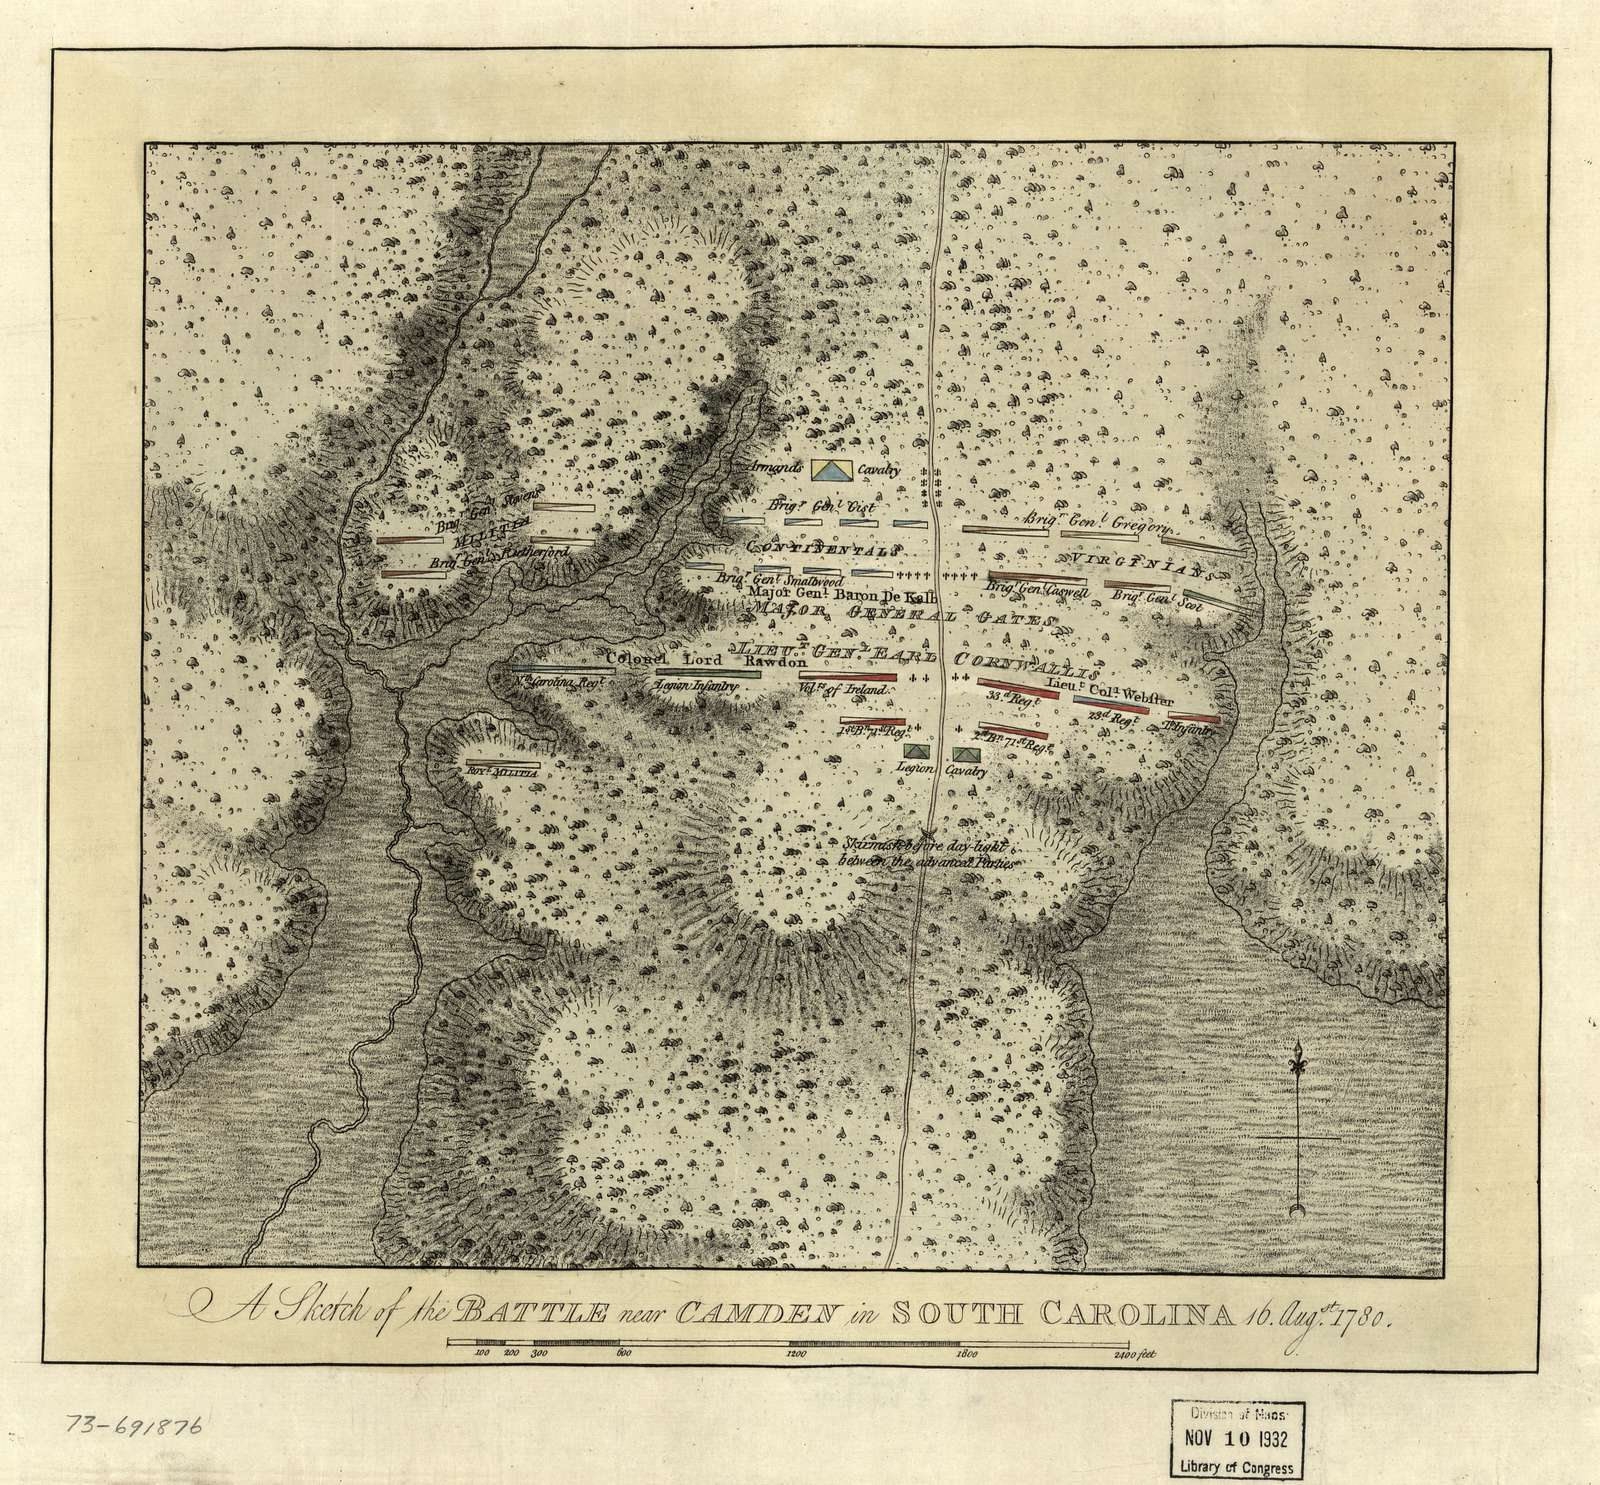 A sketch of the battle near Camden in South Carolina, 16 Augst. 1780.